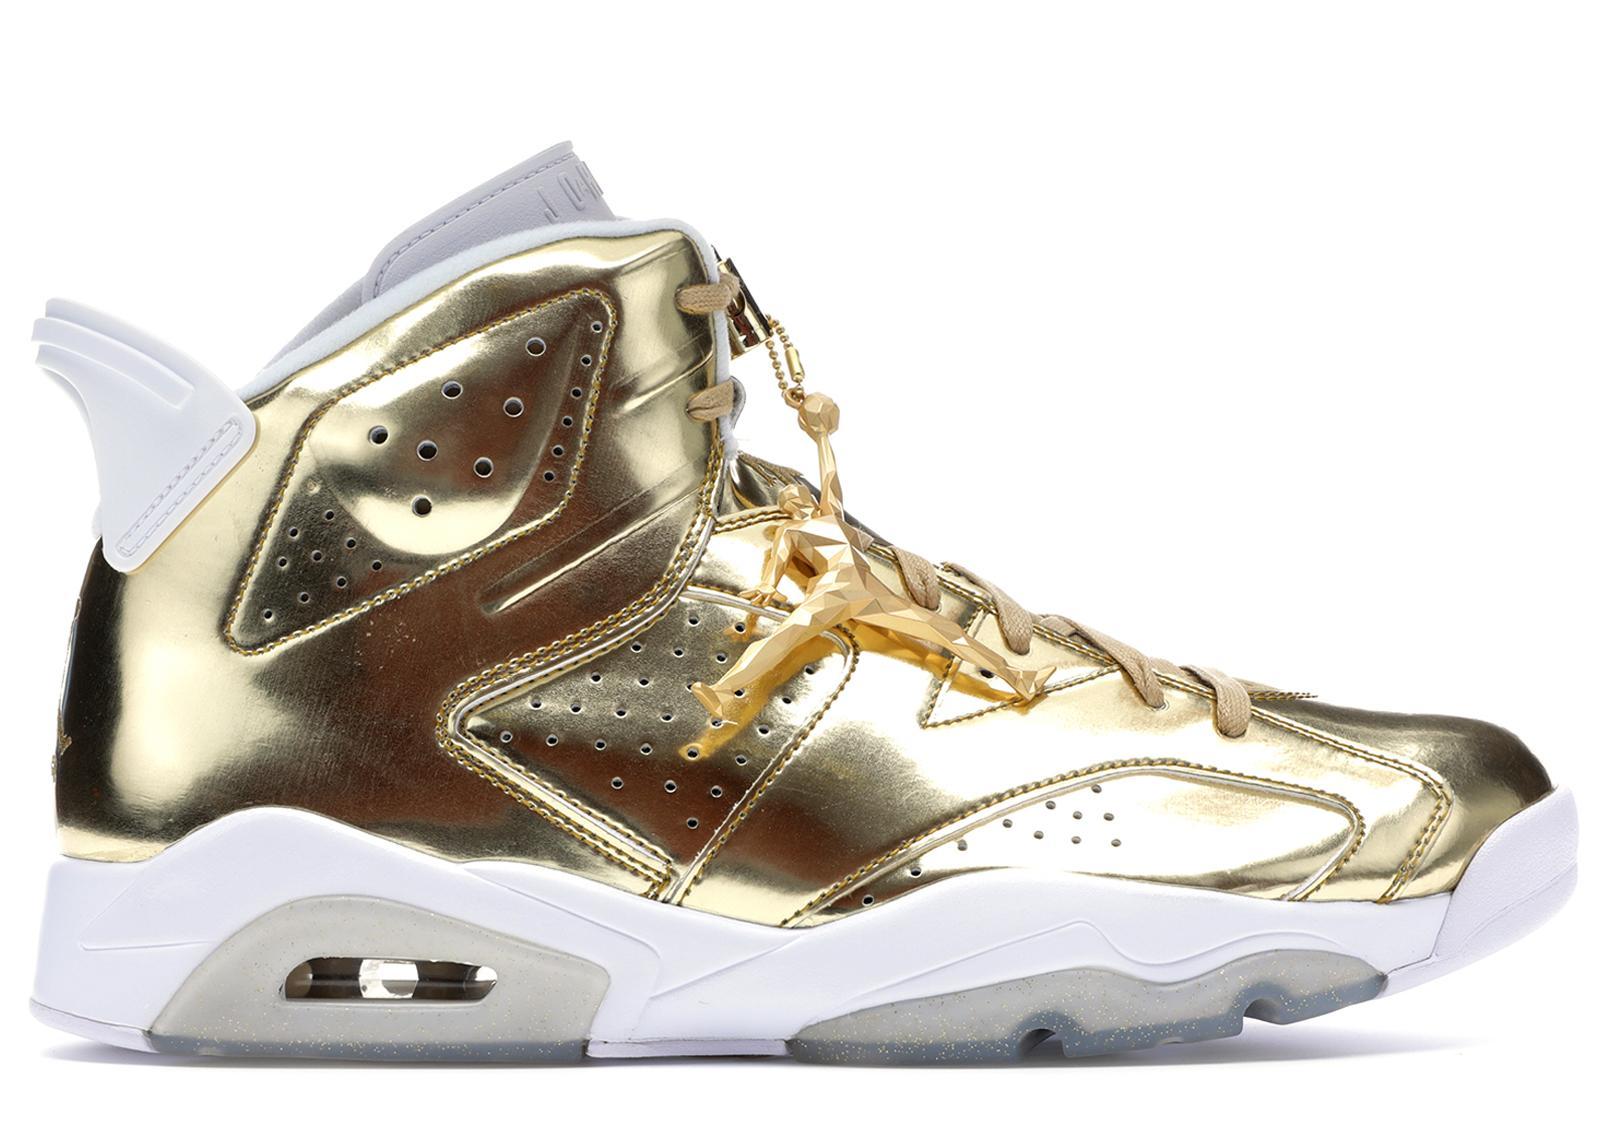 Lyst - Nike 6 Retro Pinnacle Metallic Gold in Metallic for Men 1e3e2c853e46